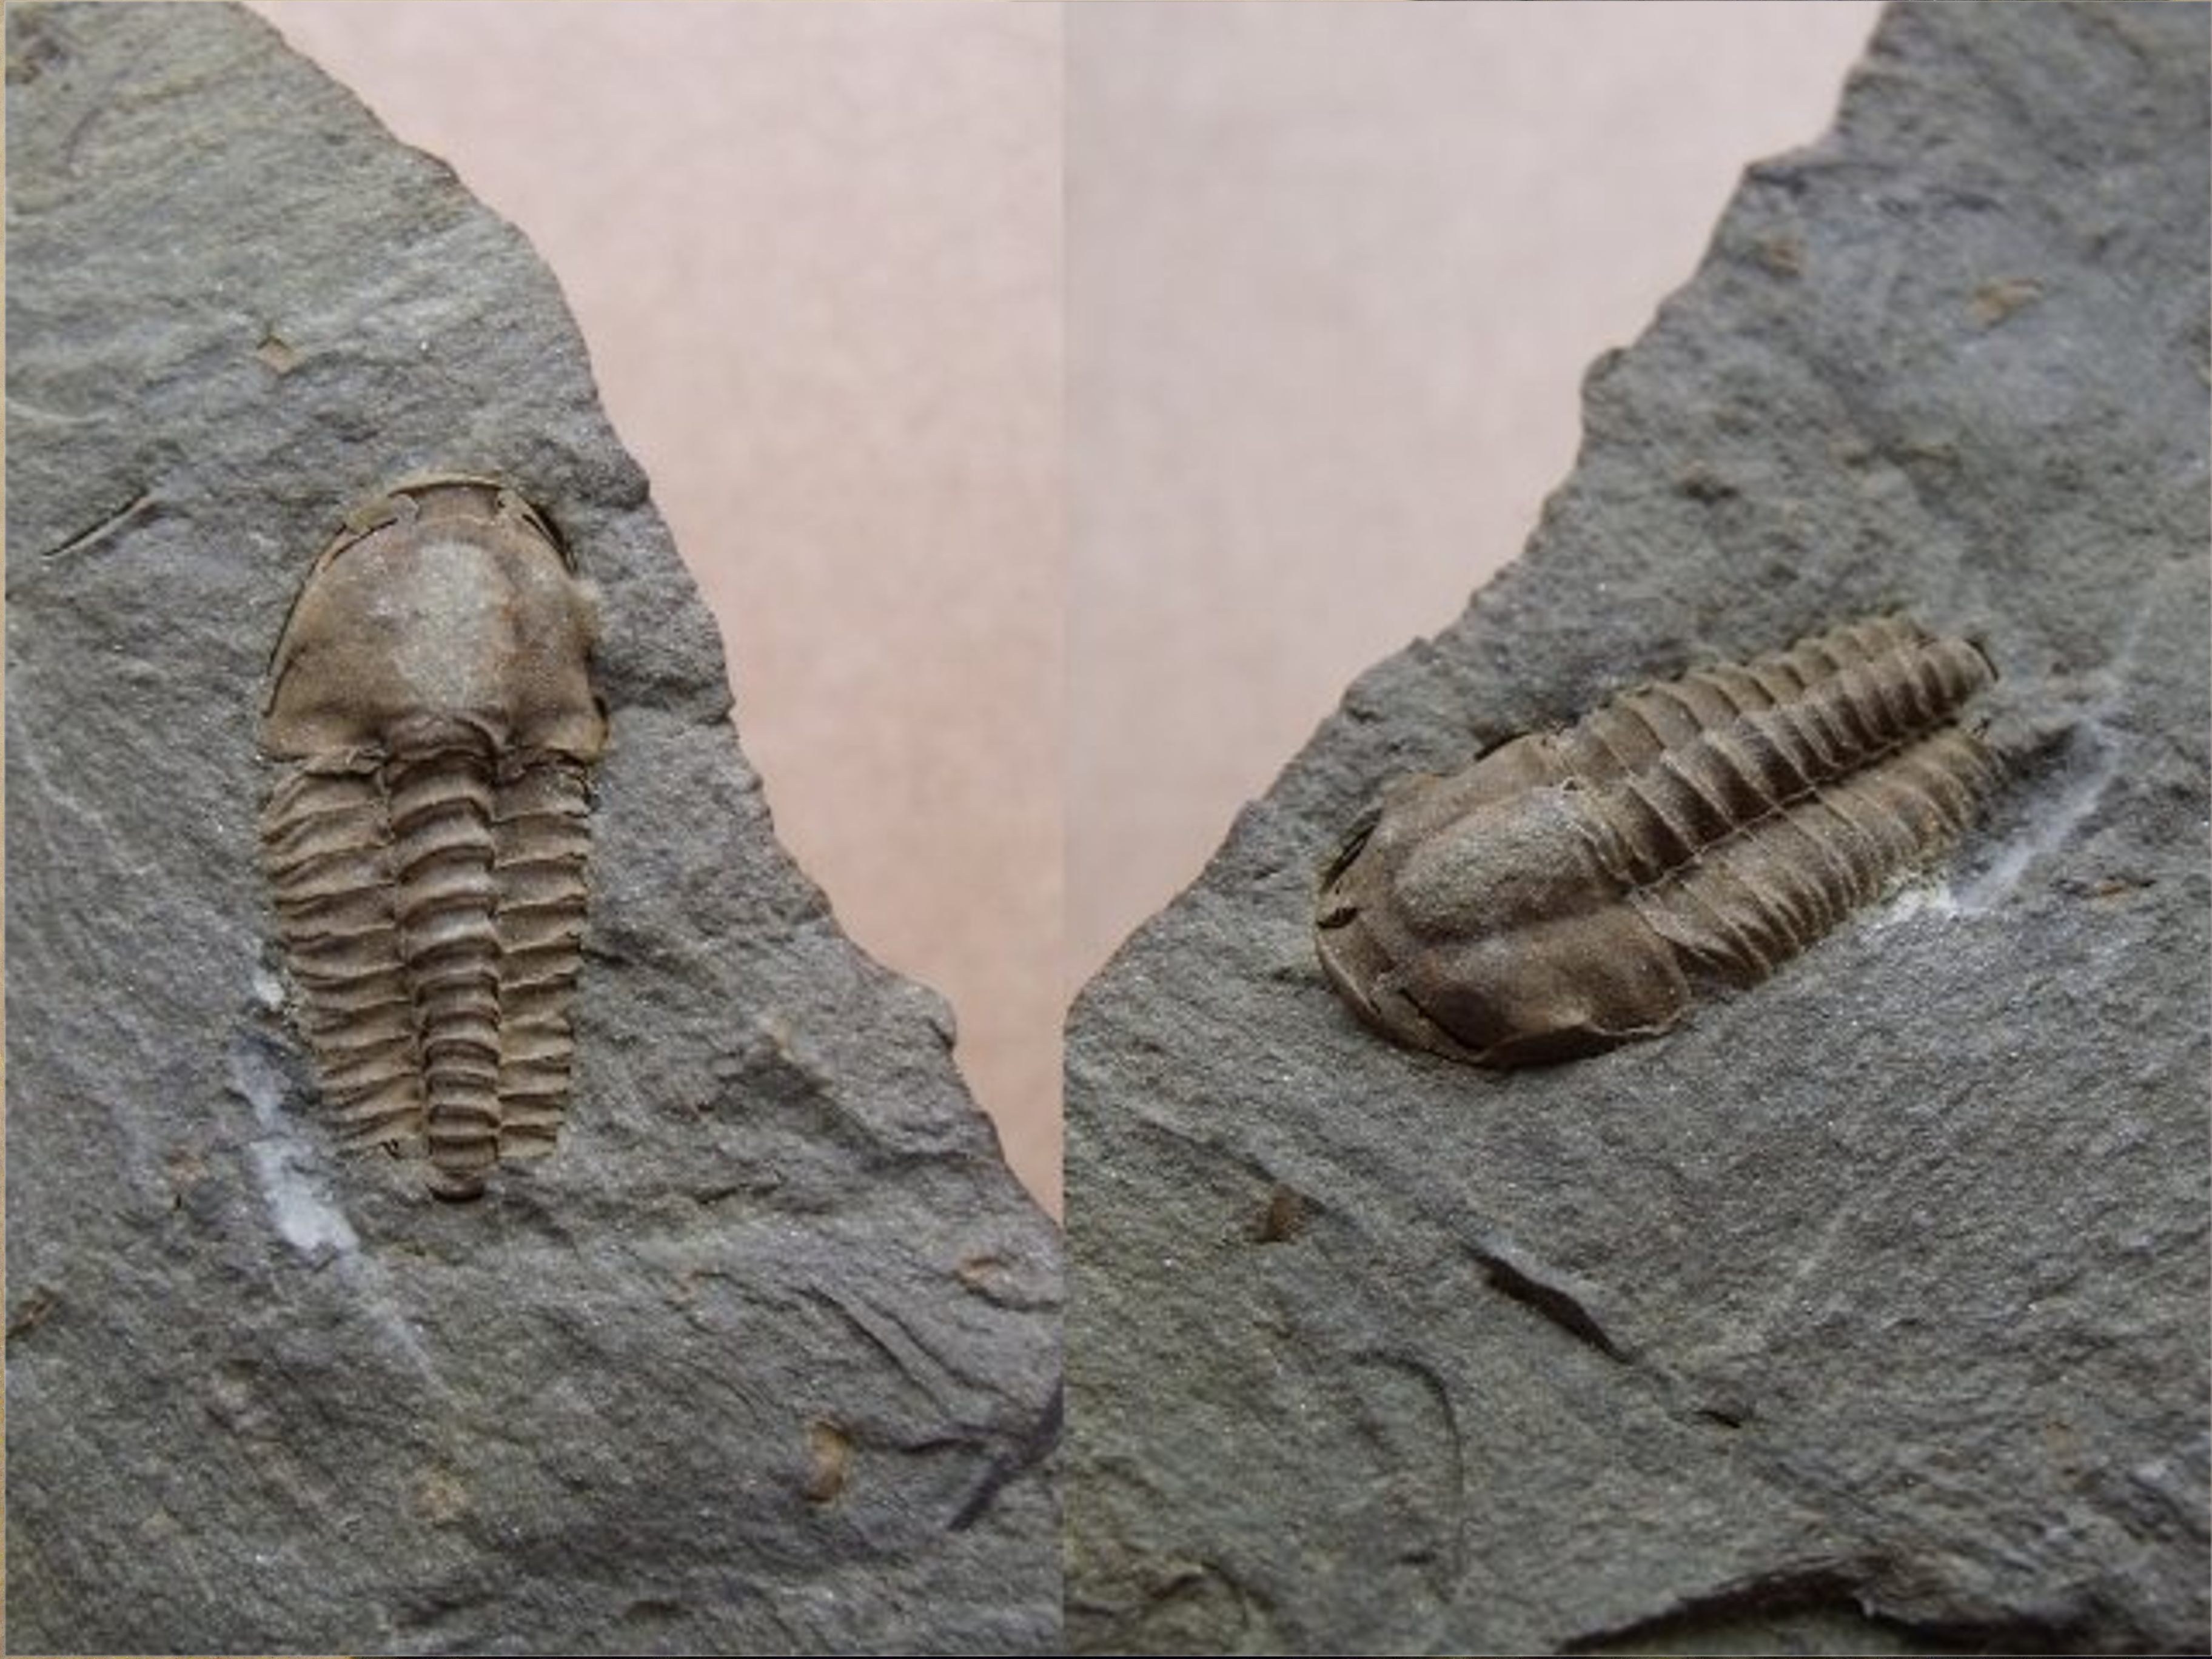 trilobit Litavkaspis rejkovicensis, (lok.Rejkovice)